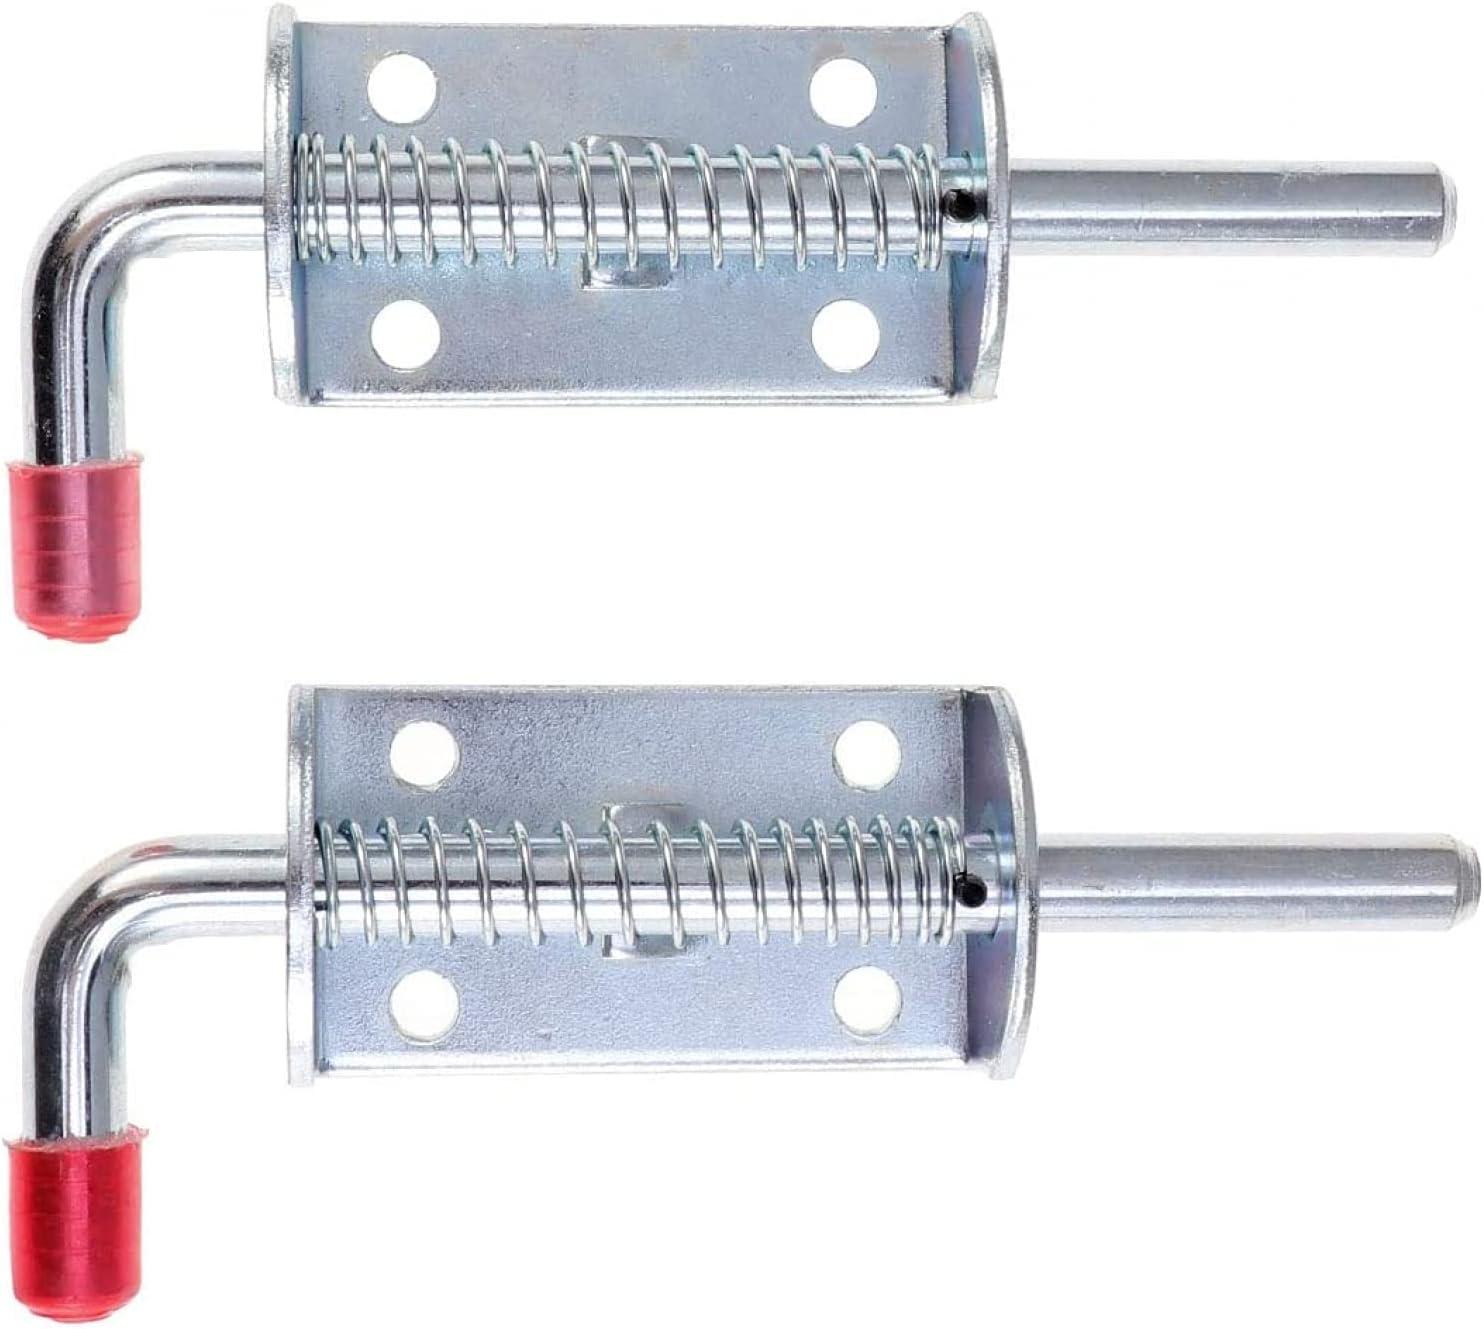 BERTY·PUYI 2pcs Spring Latch Lock Barrel Dallas Mall Washington Mall Heavy Metal Dut Bolt